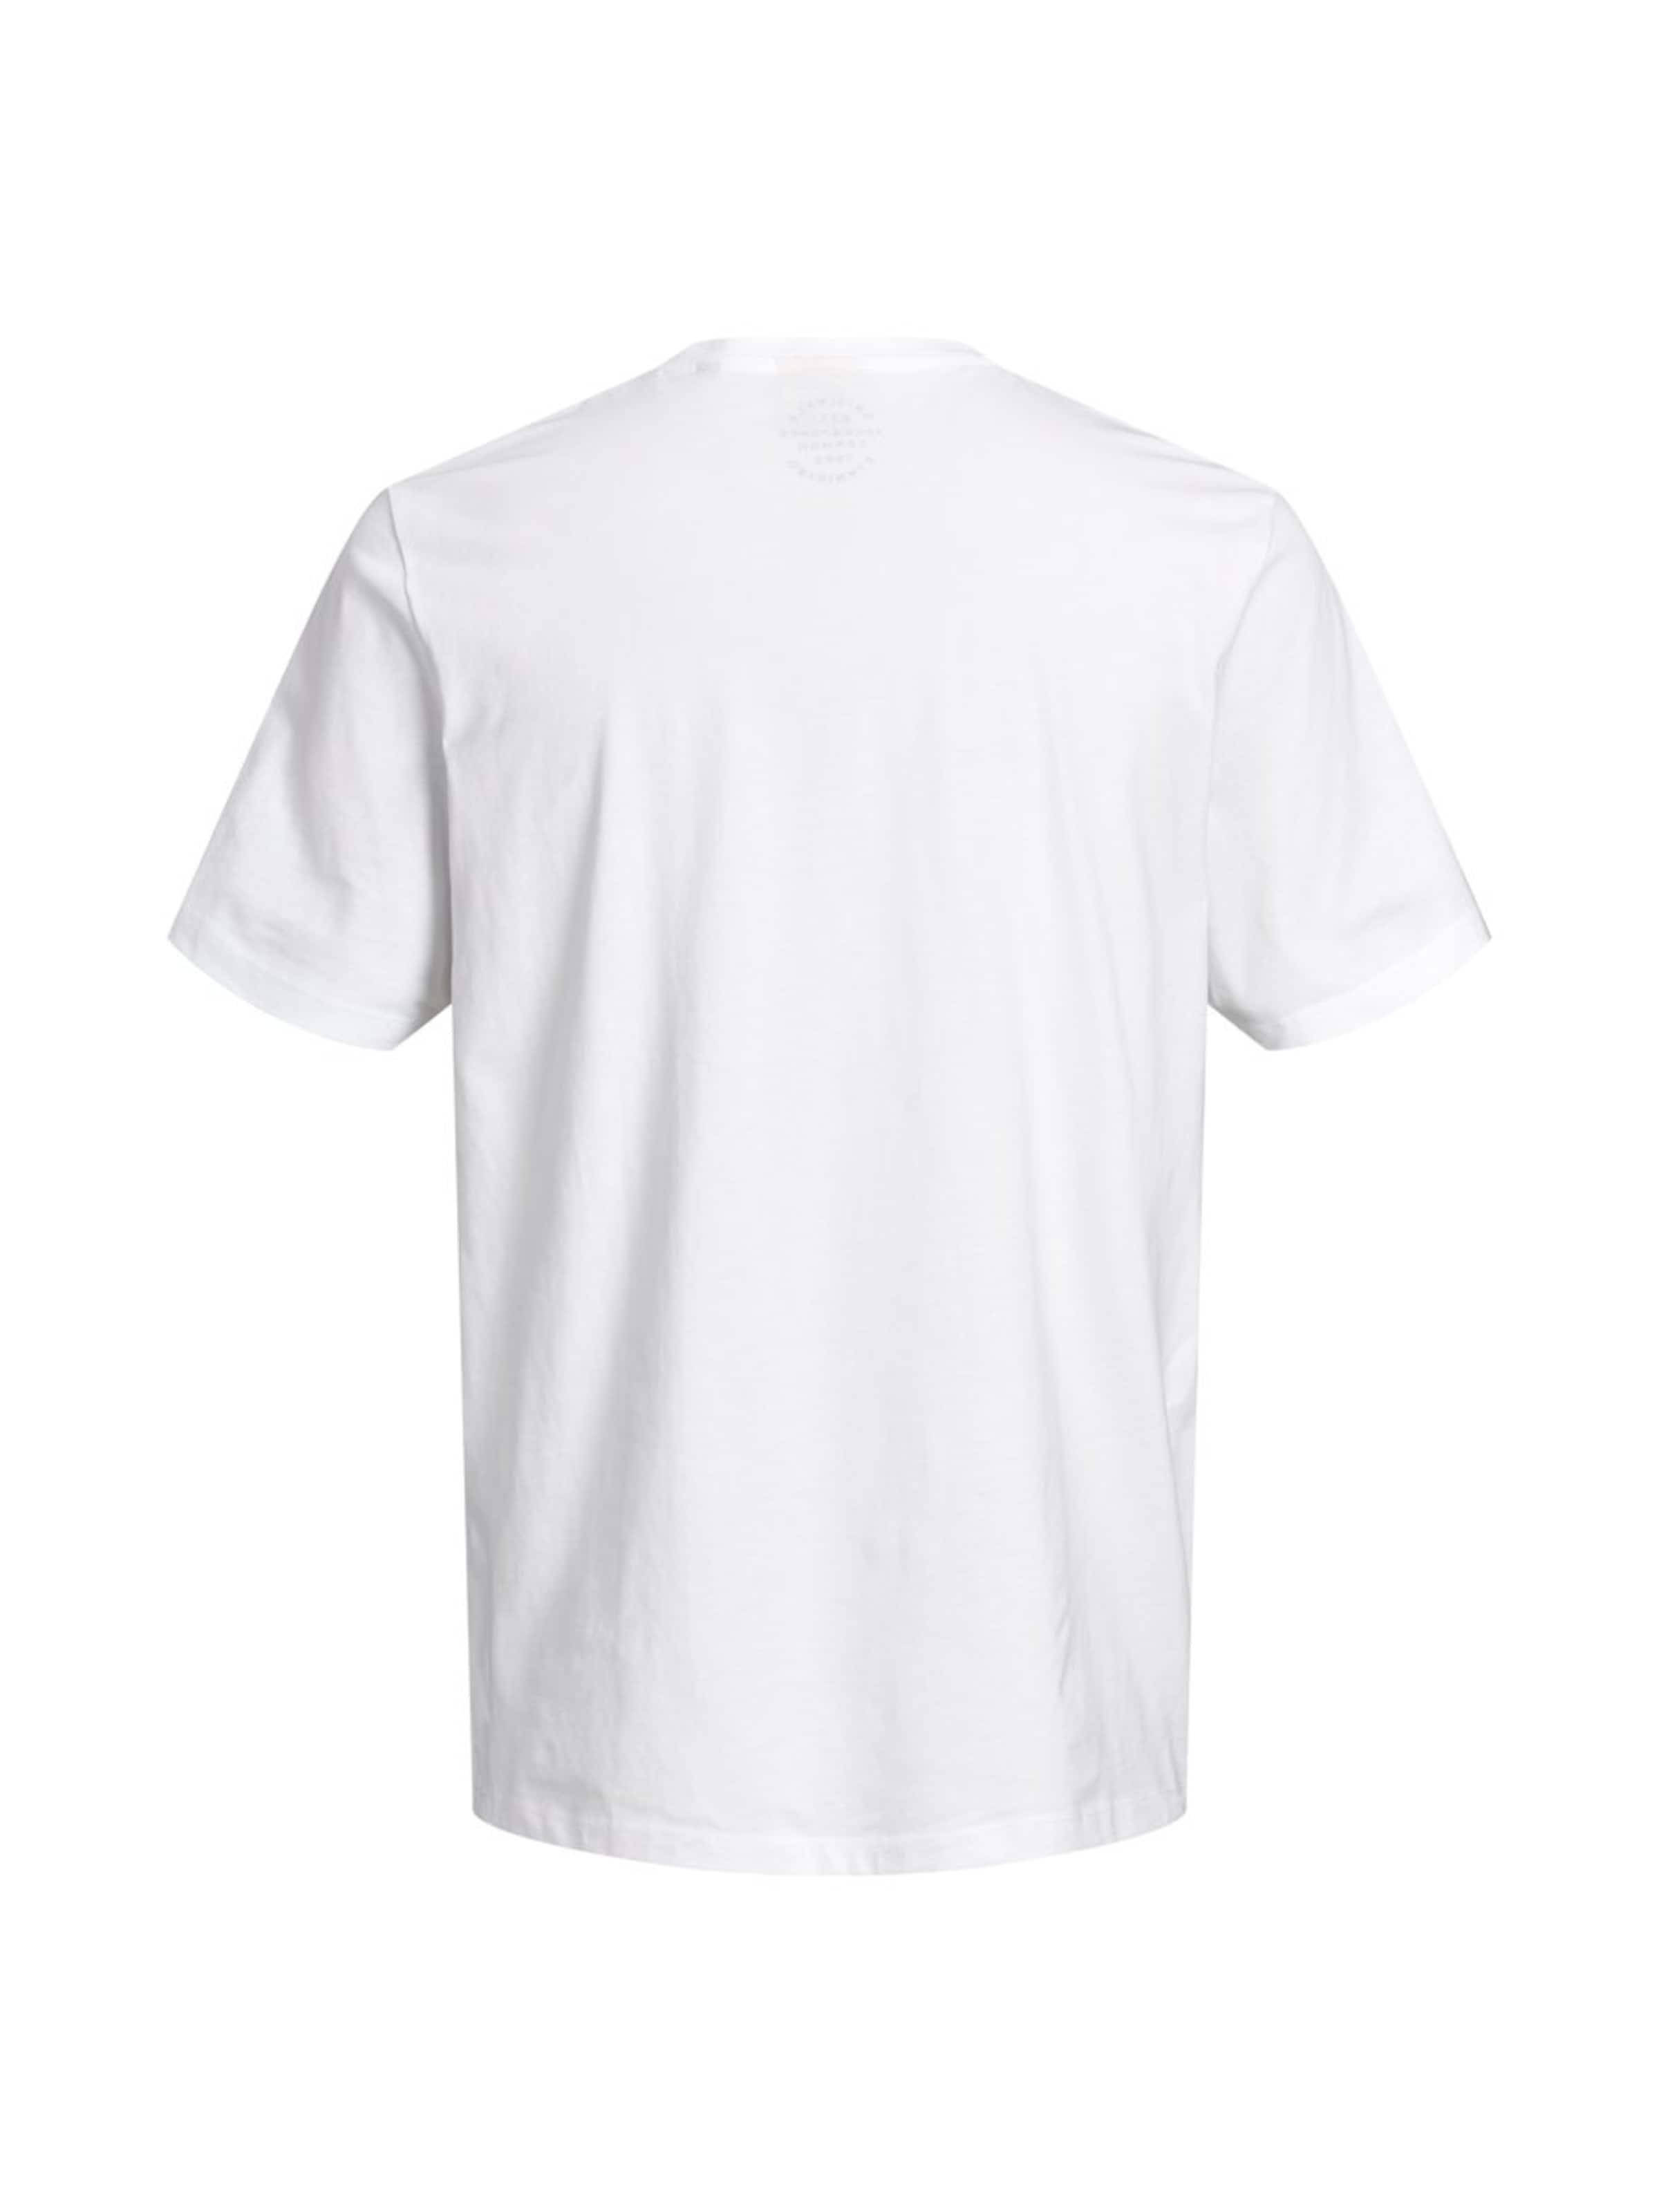 In Jones T Jackamp; GelbSchwarz shirt Weiß Yf7gby6